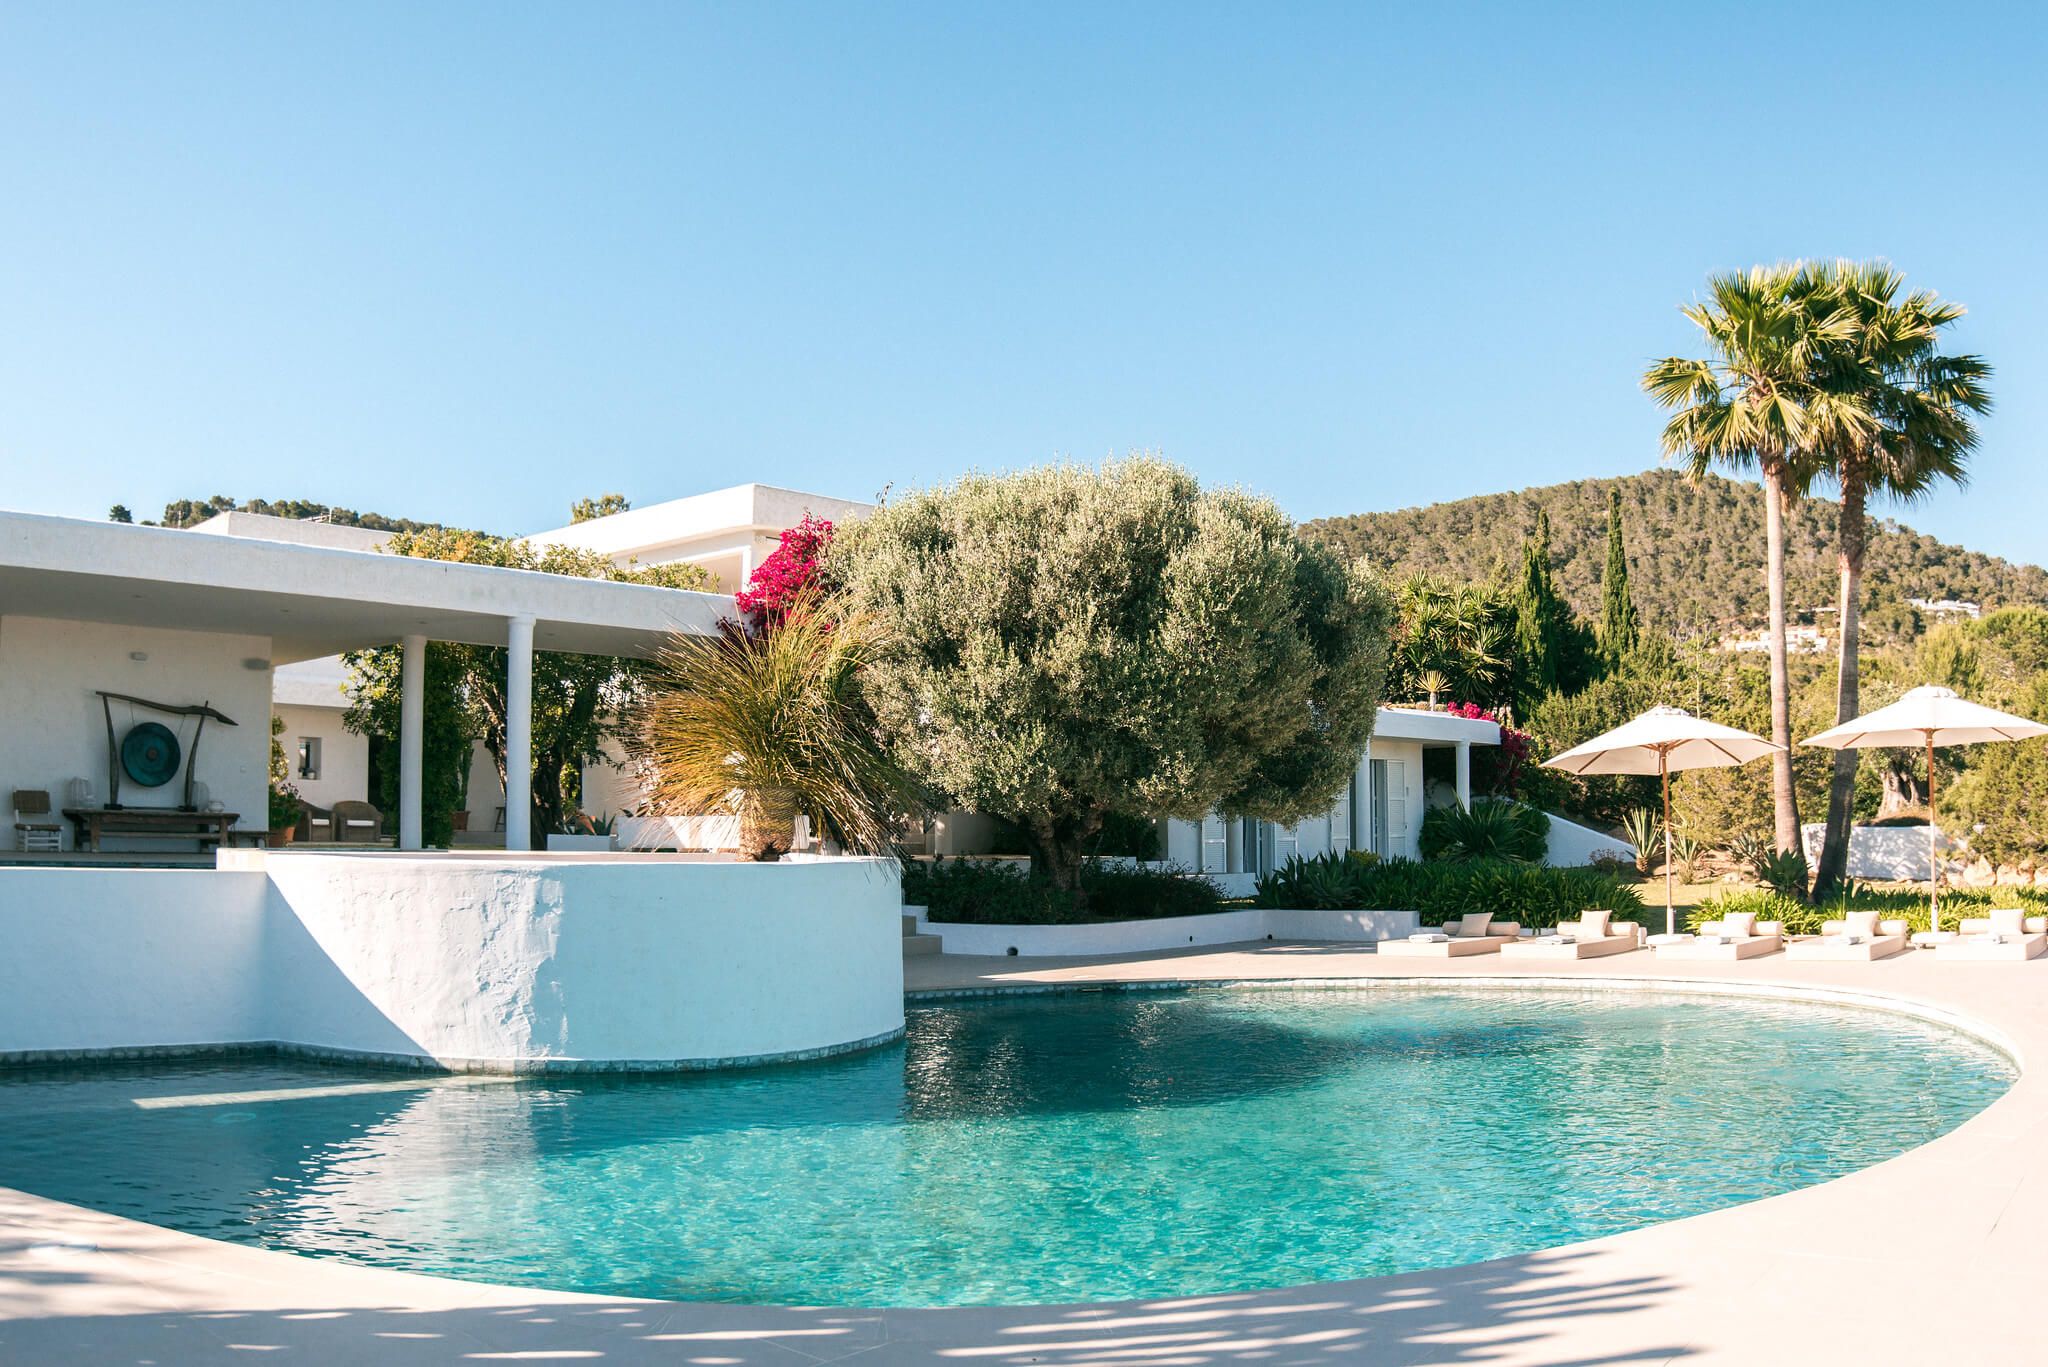 https://www.white-ibiza.com/wp-content/uploads/2020/06/white-ibiza-villas-casa-odette-exterior-pool.jpg